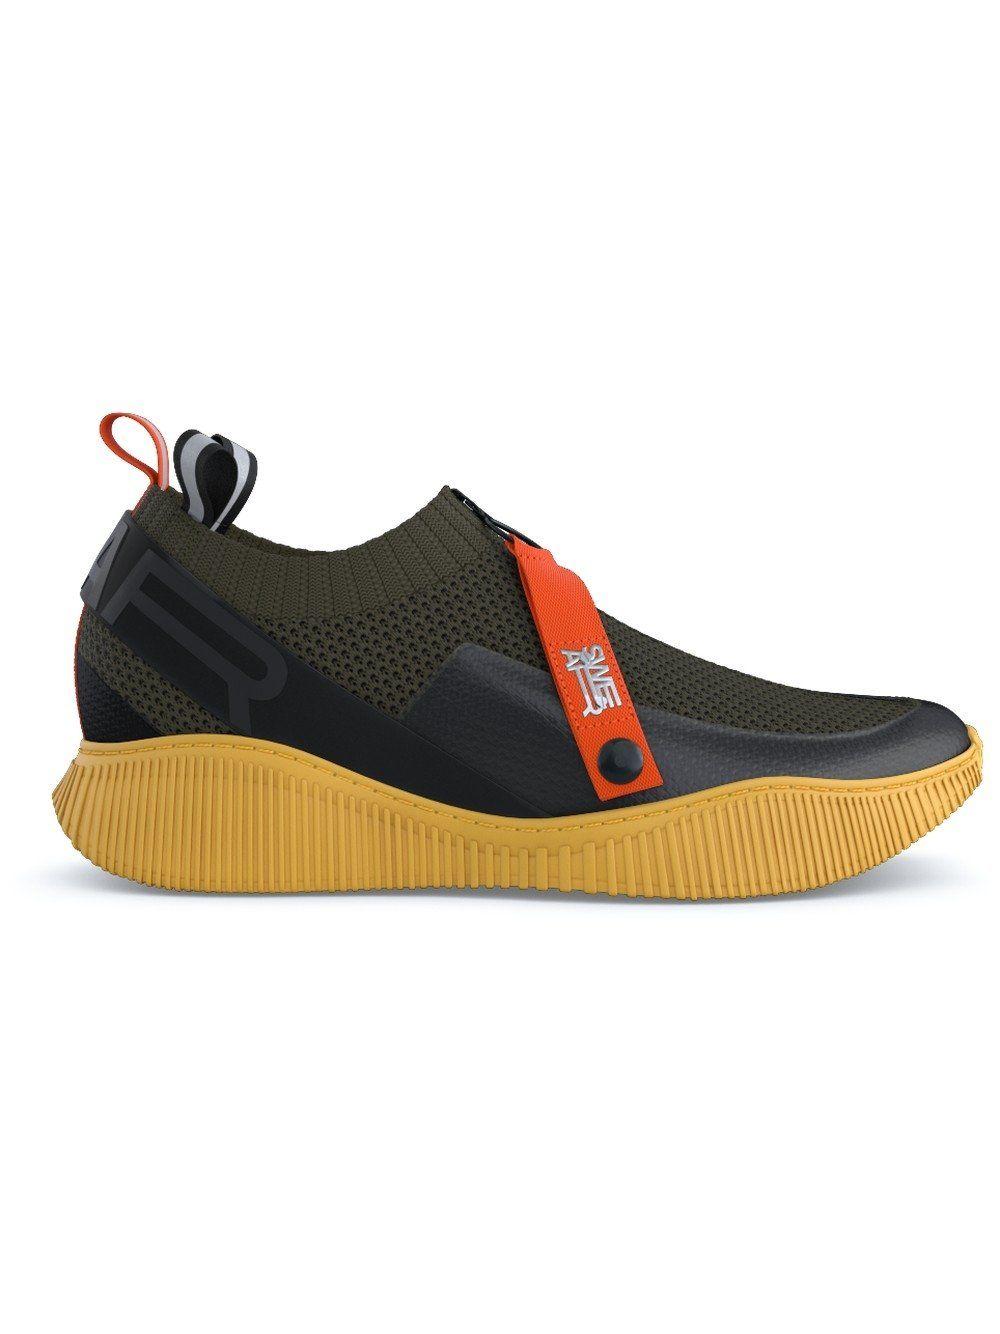 zapatos deportivos under armour hombre hym